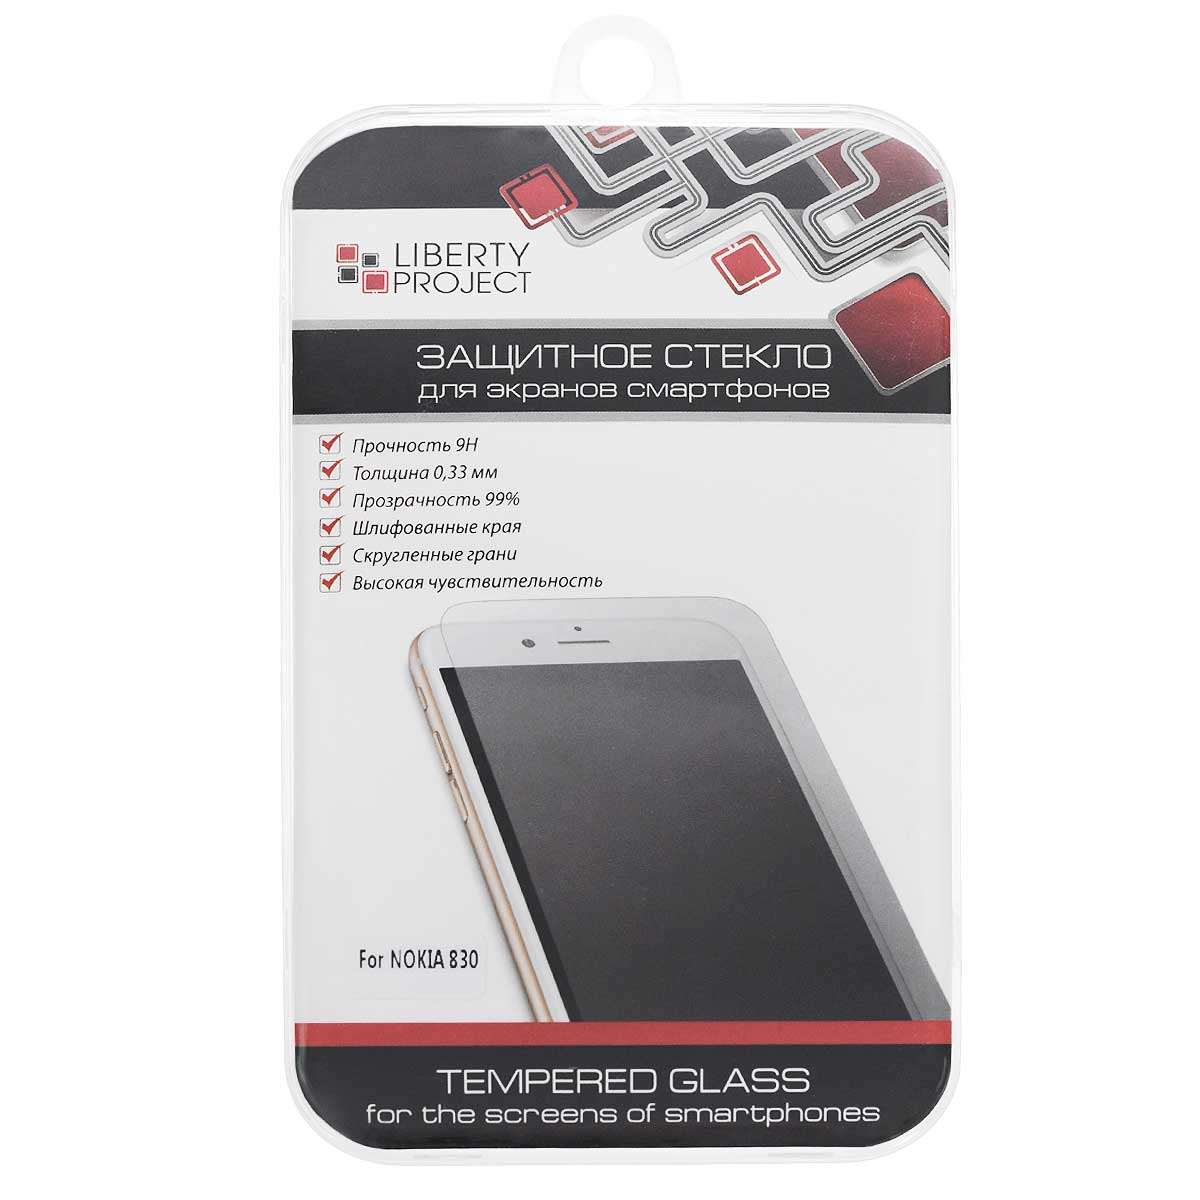 Liberty Project Tempered Glass защитное стекло для Nokia 830, Clear (0,33 мм) защитные стекла liberty project защитное стекло lp для nokia lumia 550 tempered glass 0 33 мм 9h ударопрочное конверт